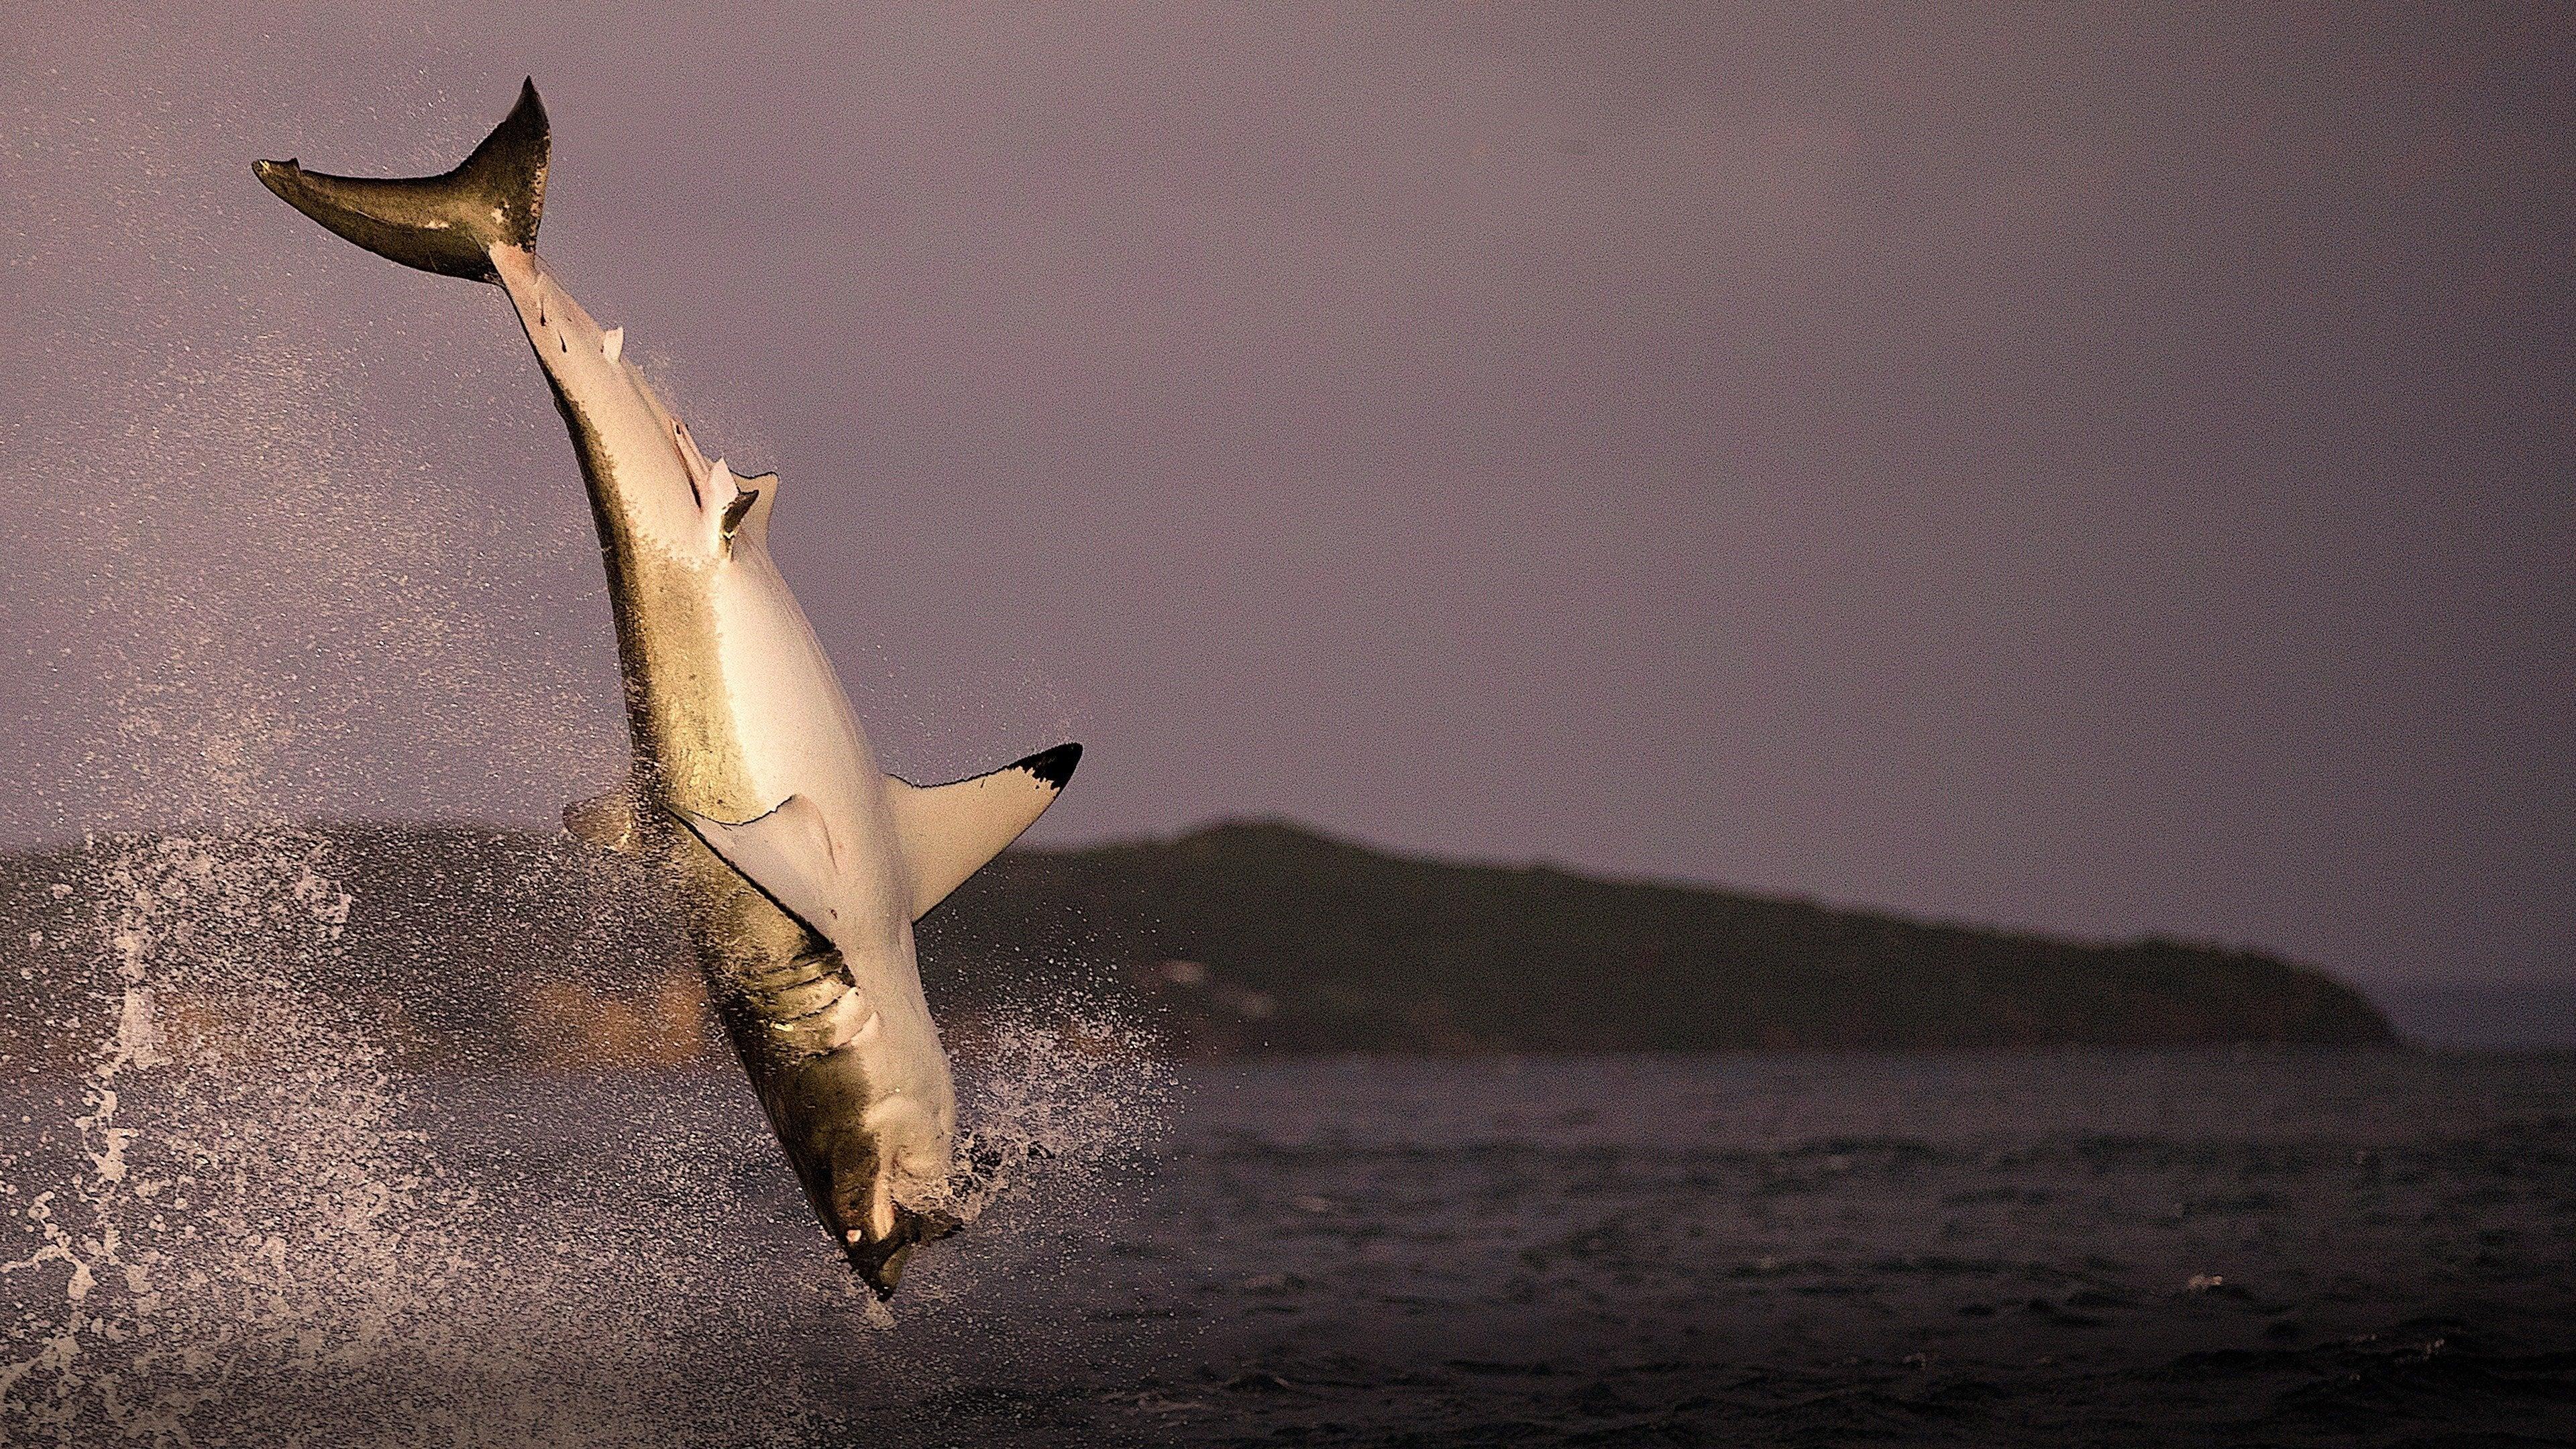 Air Jaws Strikes Back: Sharkmania